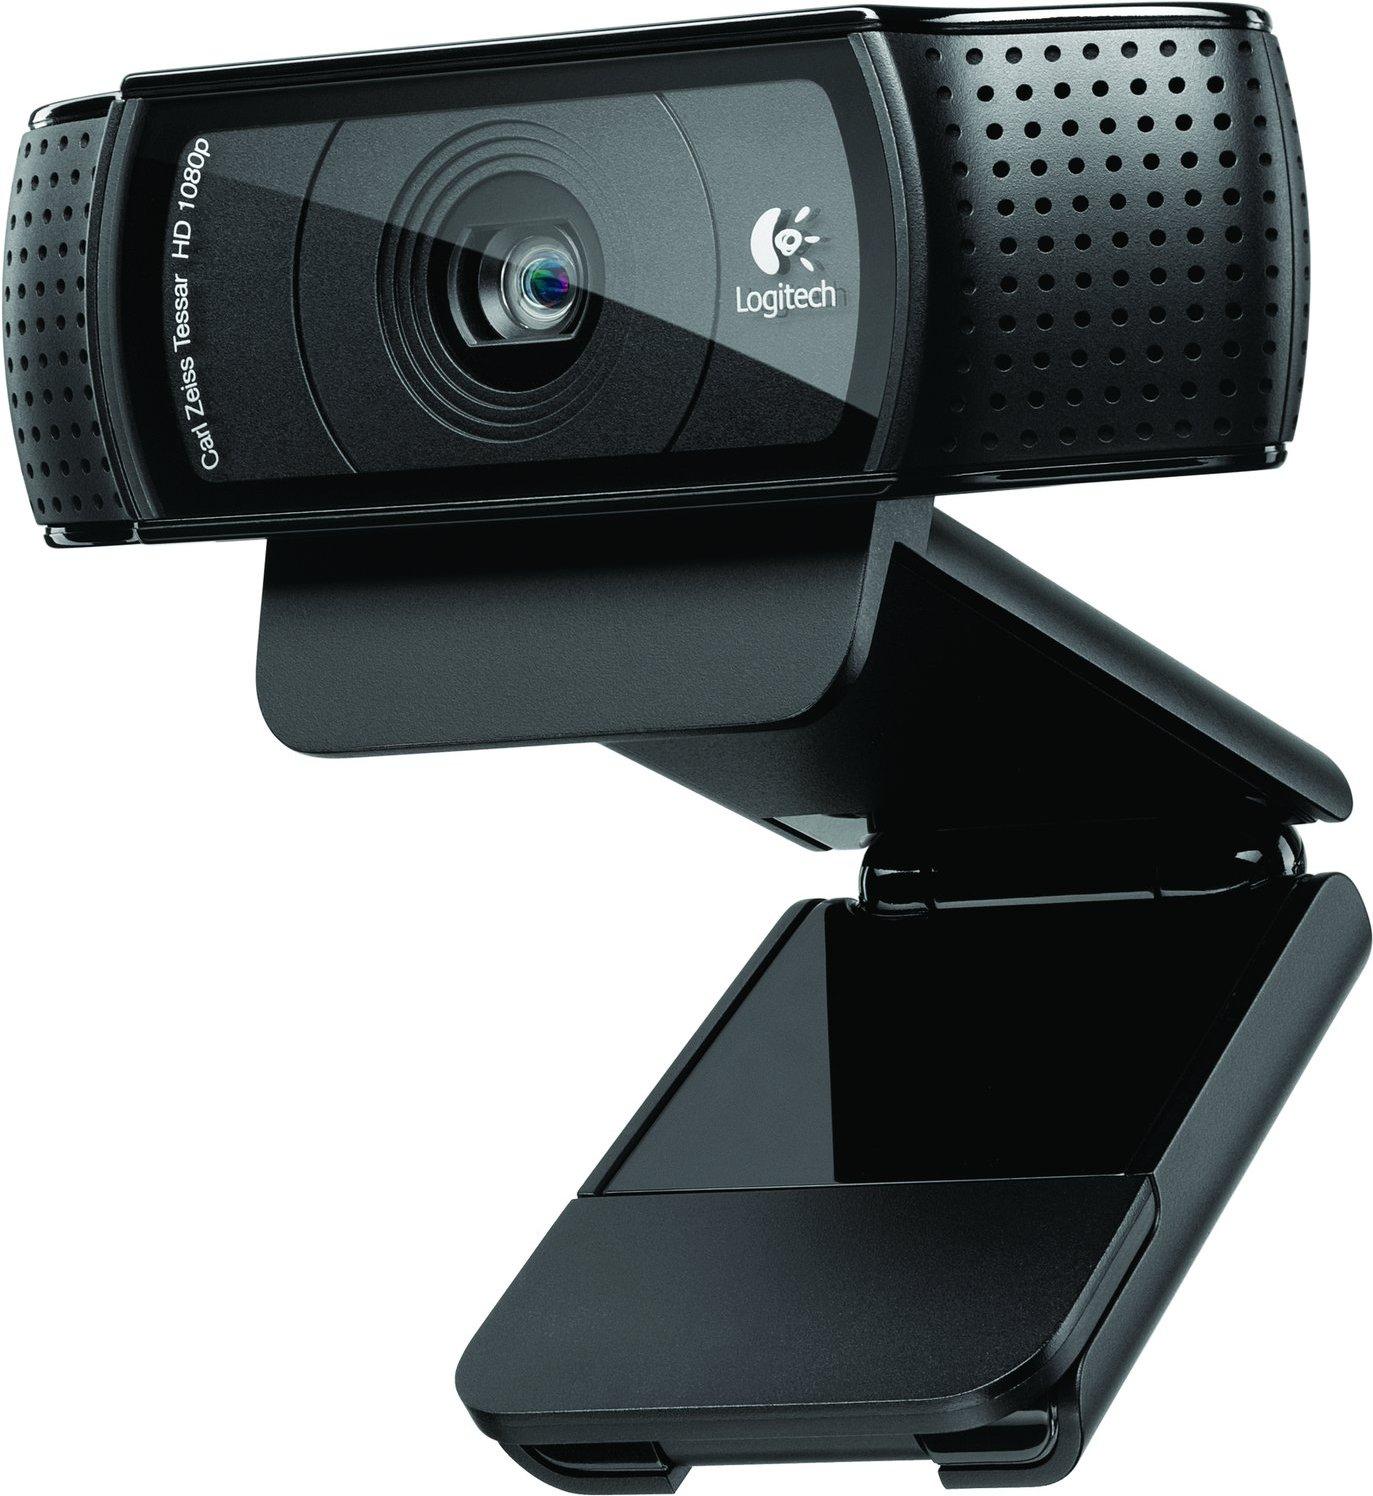 Logitech C920 HD Pro USB 1080p Webcam [Amazon UK]